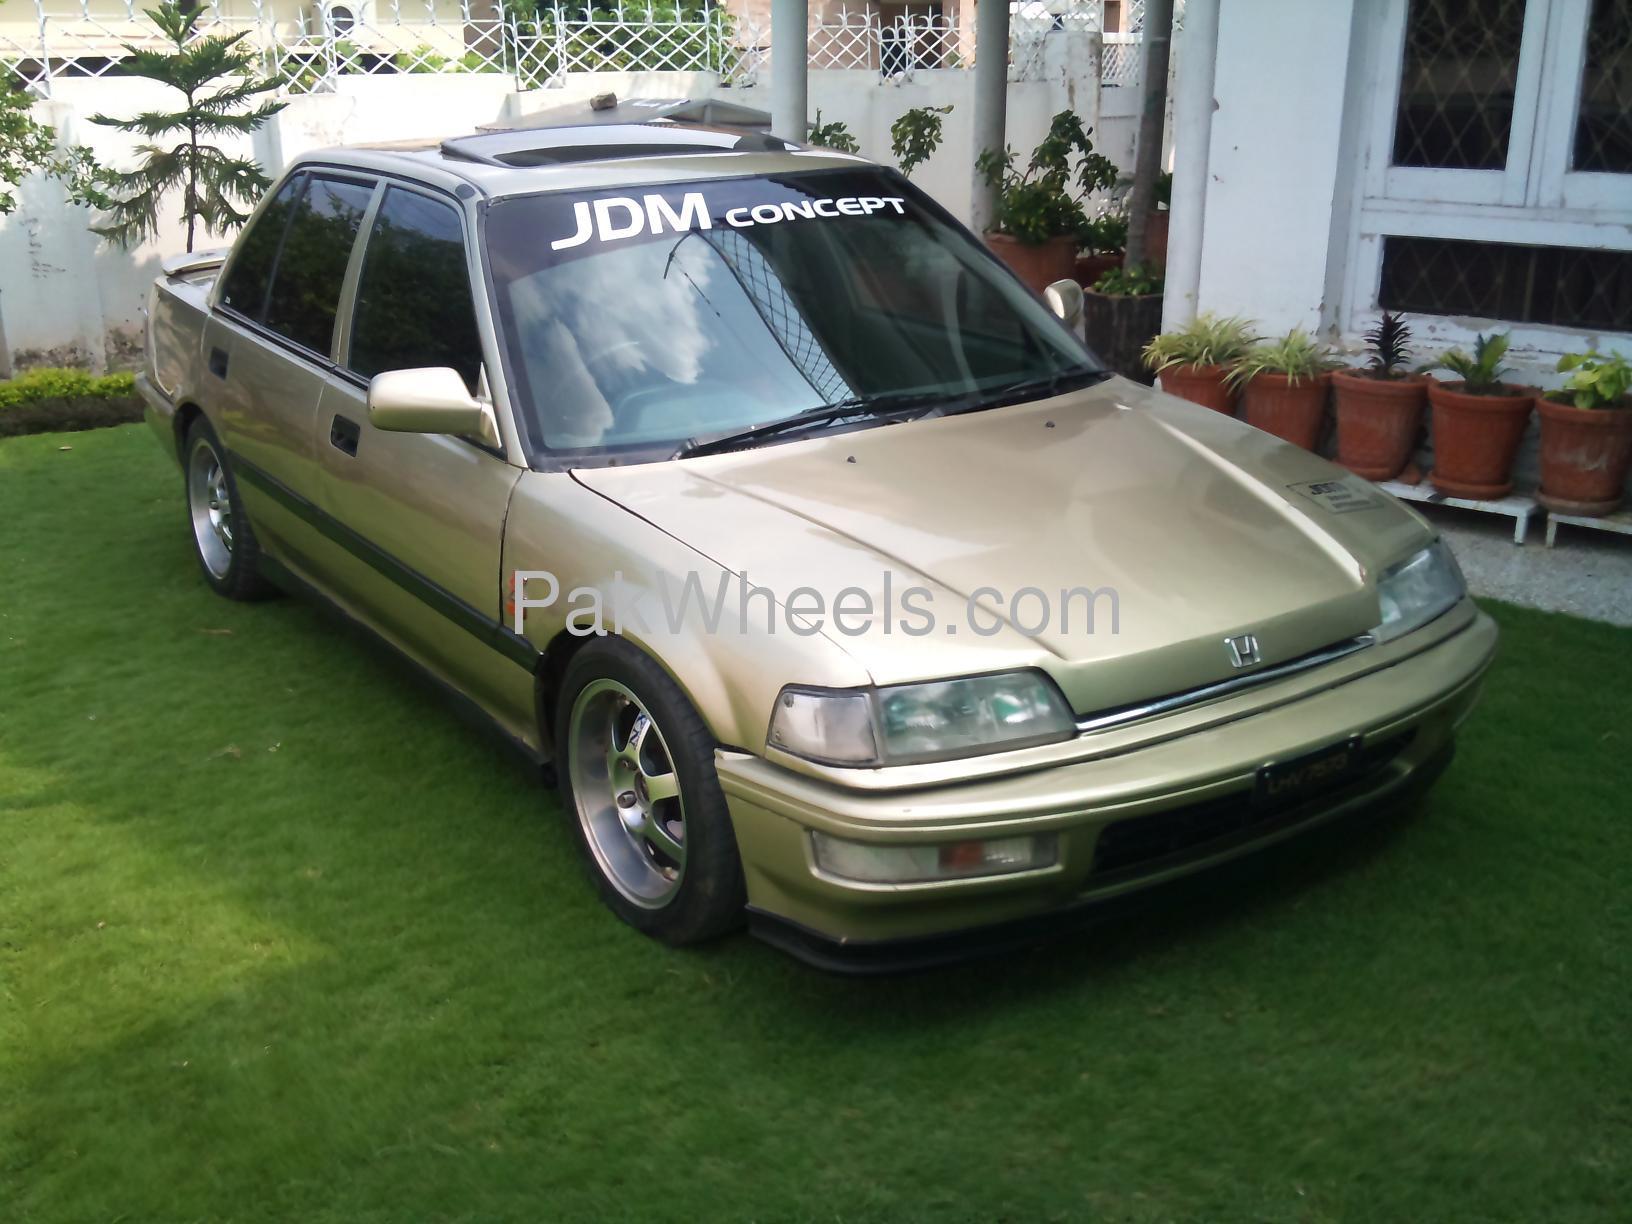 Honda civic 4th gen 1988-1991 fan club. - honda civic 1988 627715